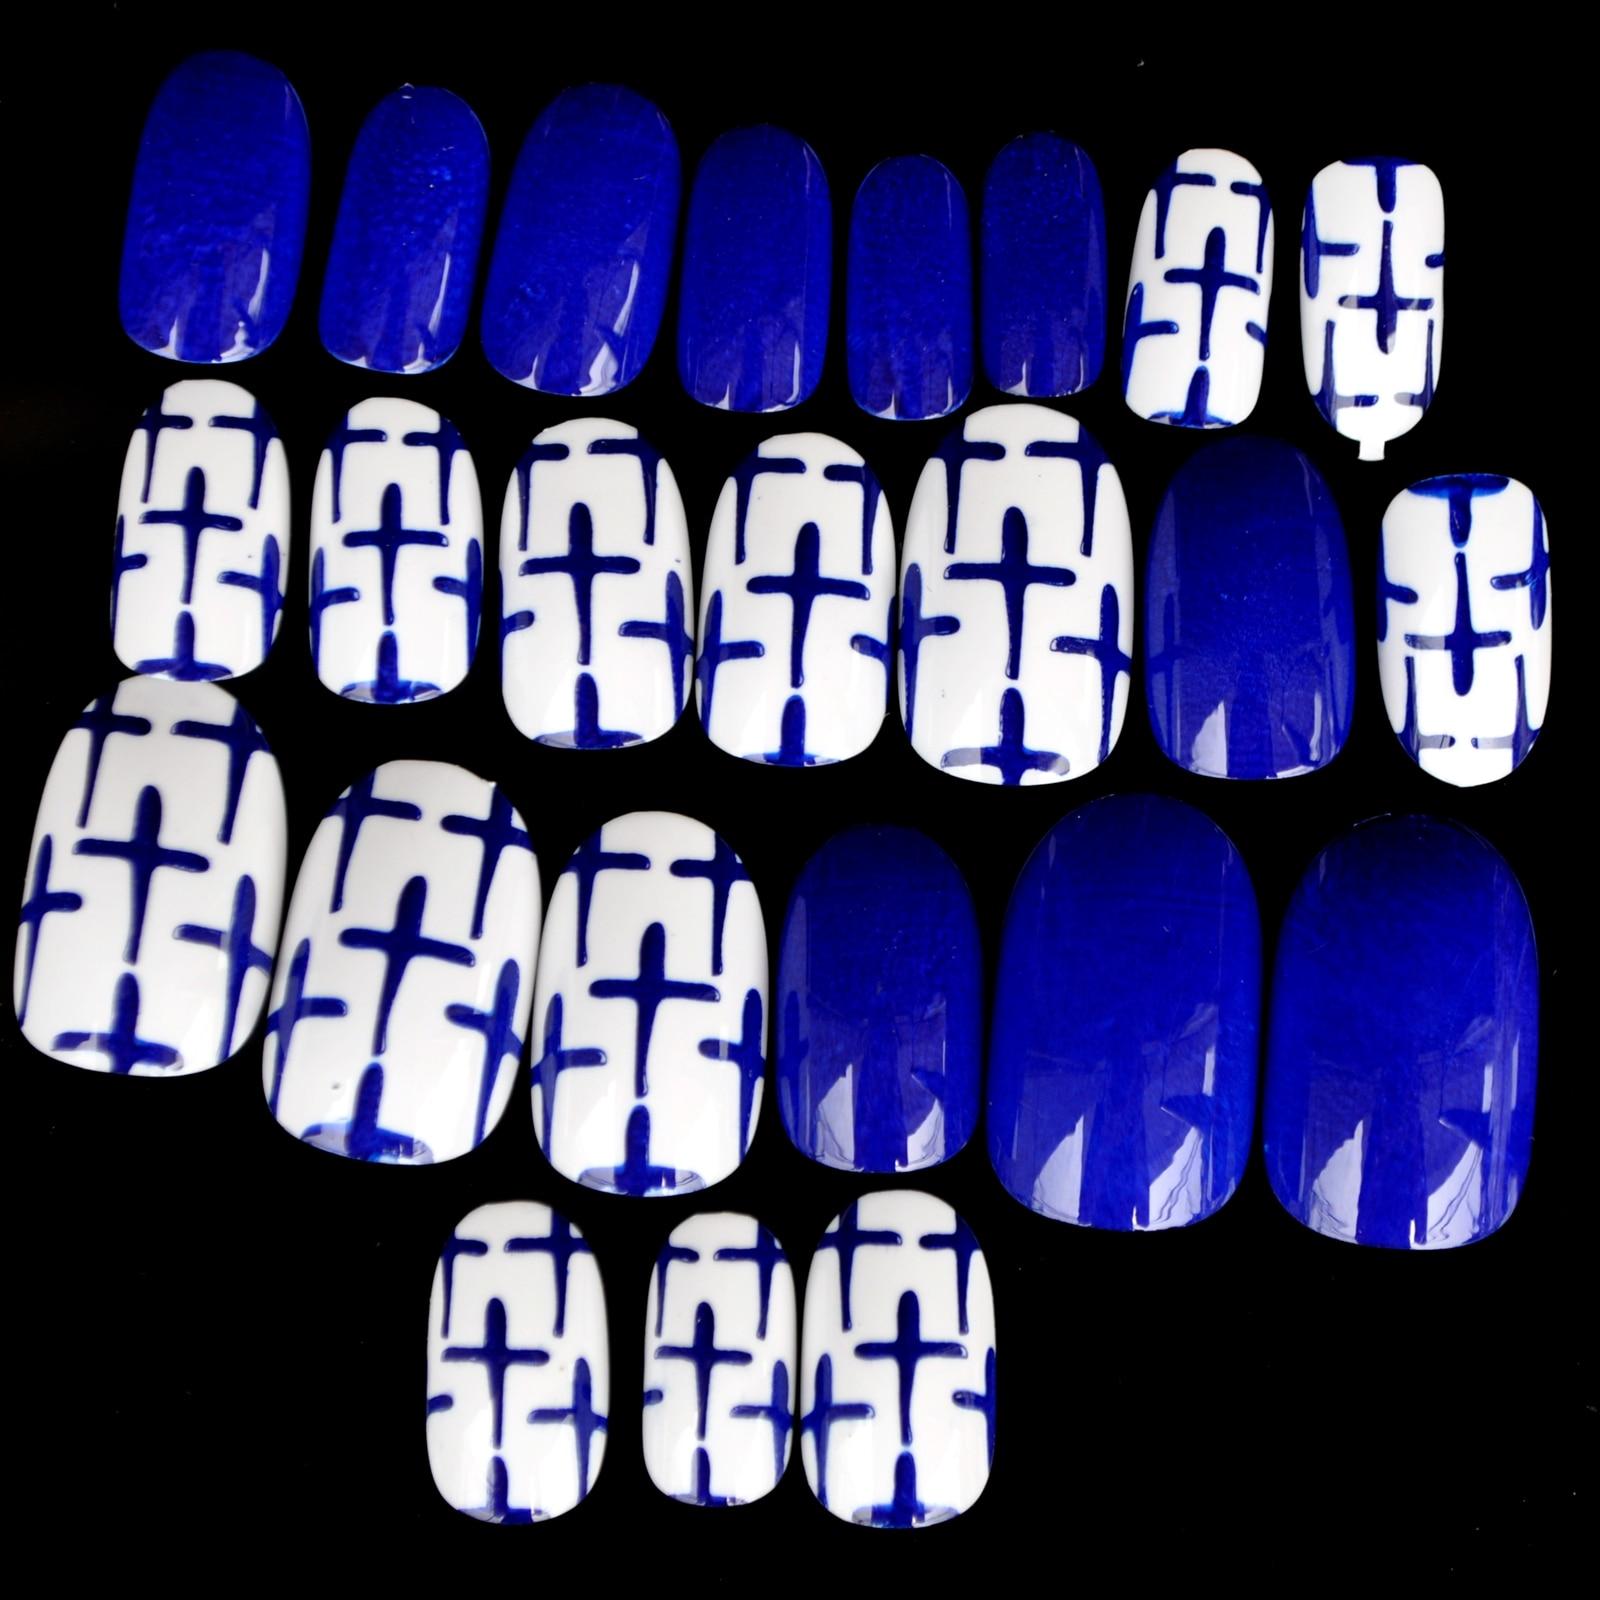 Diamond Blue Press On Nails Crossing Design White Round Acrylic Designed Nail Tips Shiny 24pcs/ kit Z901